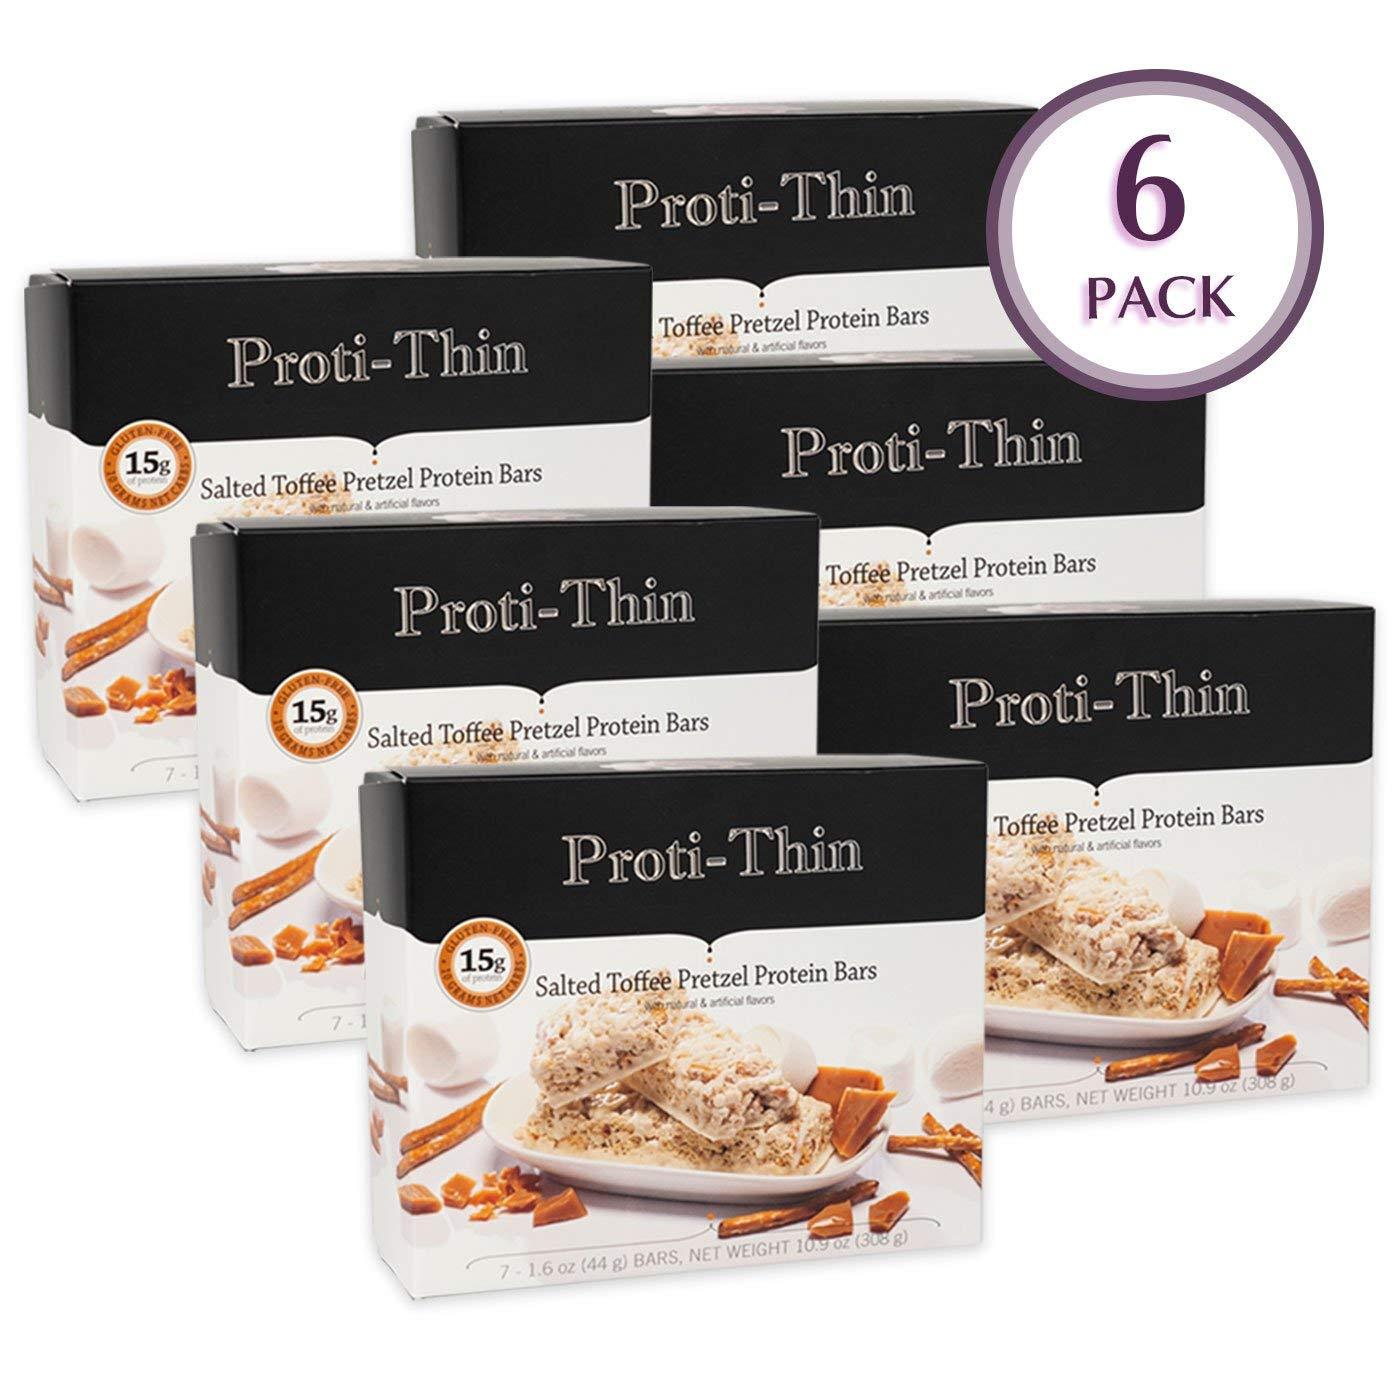 Proti-Thin - Salted Toffee Pretzel Protein Bar - 15g Protein - Low-Carb Diet Bar - High Fiber Snack Bar - Gluten Free - 6 Boxes (Save 10%)